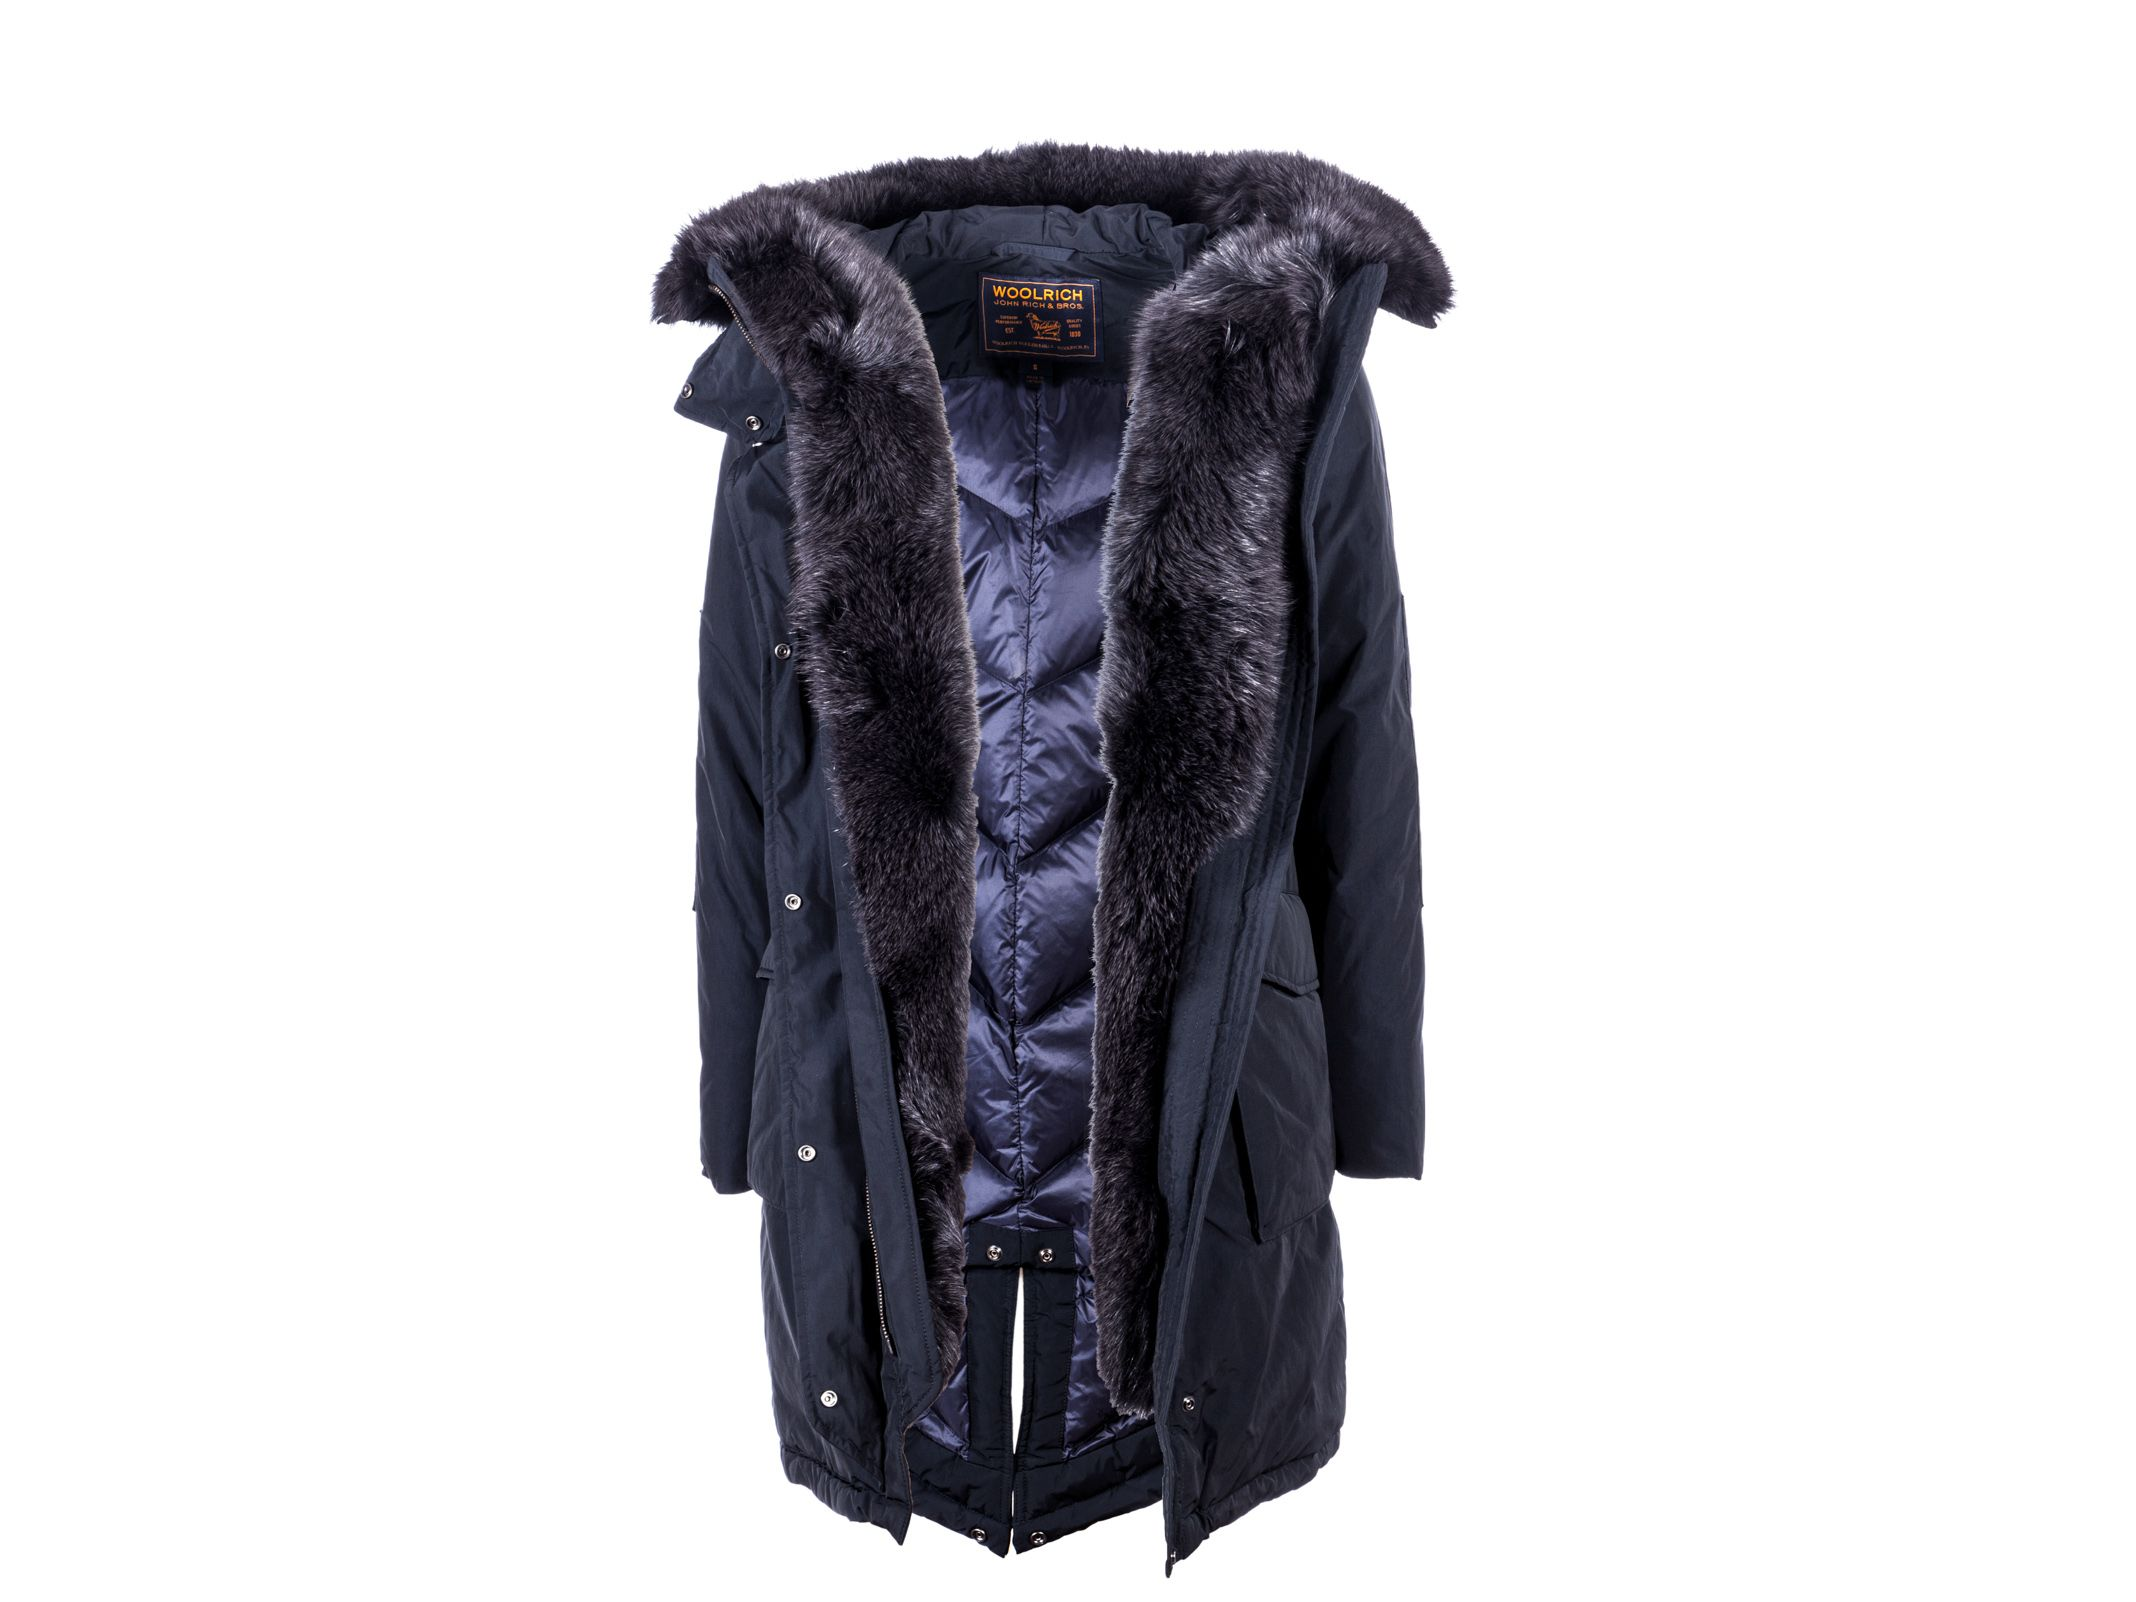 Woolrich - Woolrich Hooded Military Parka New Fur - Blue, Women's ...